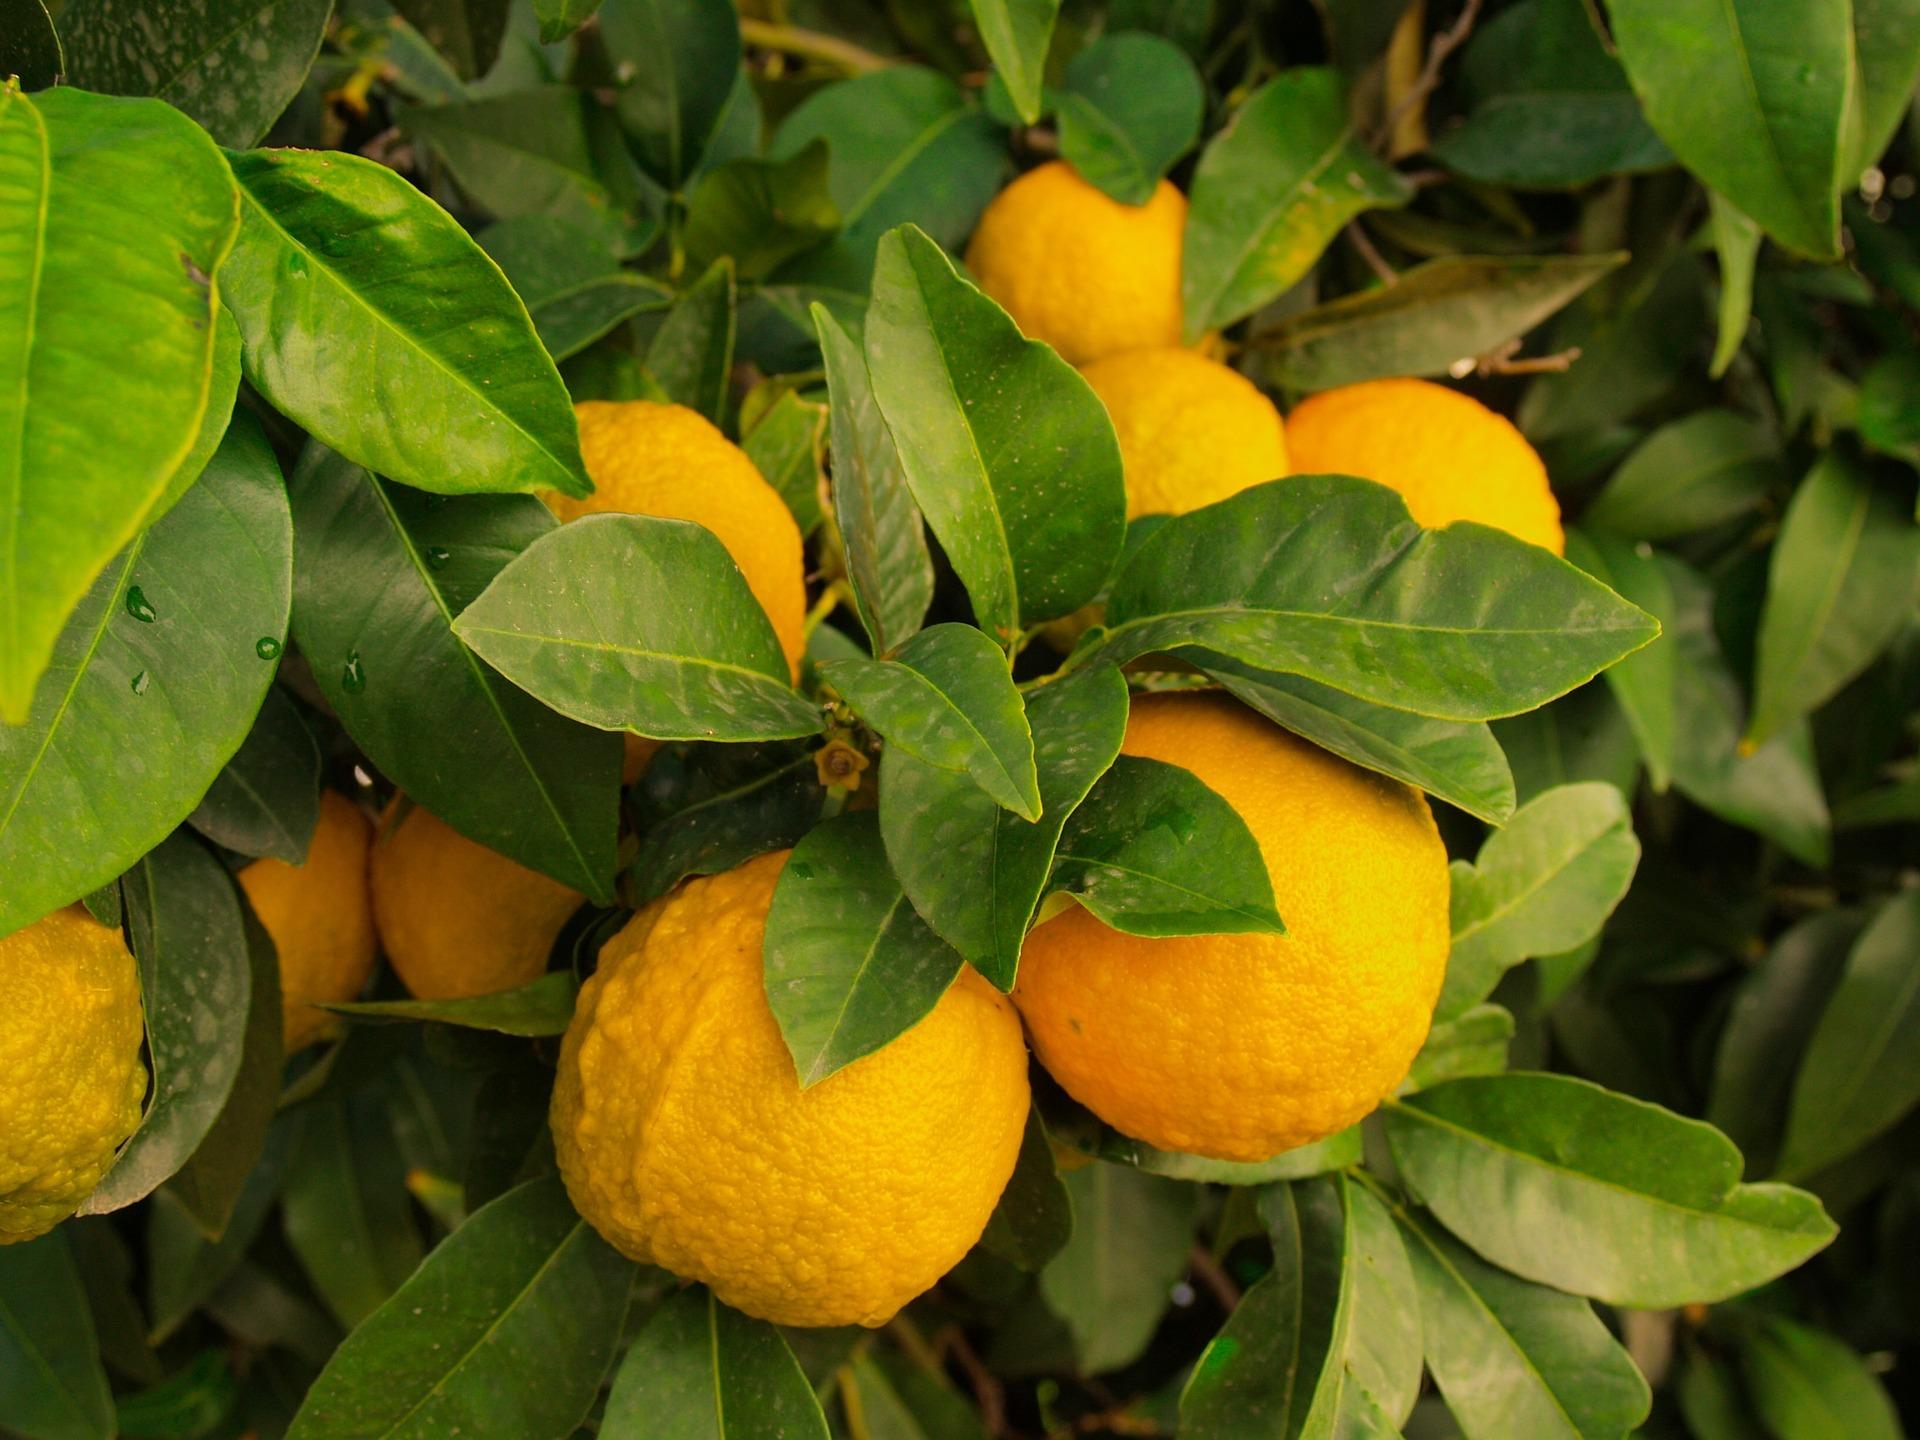 close up of lemon tree